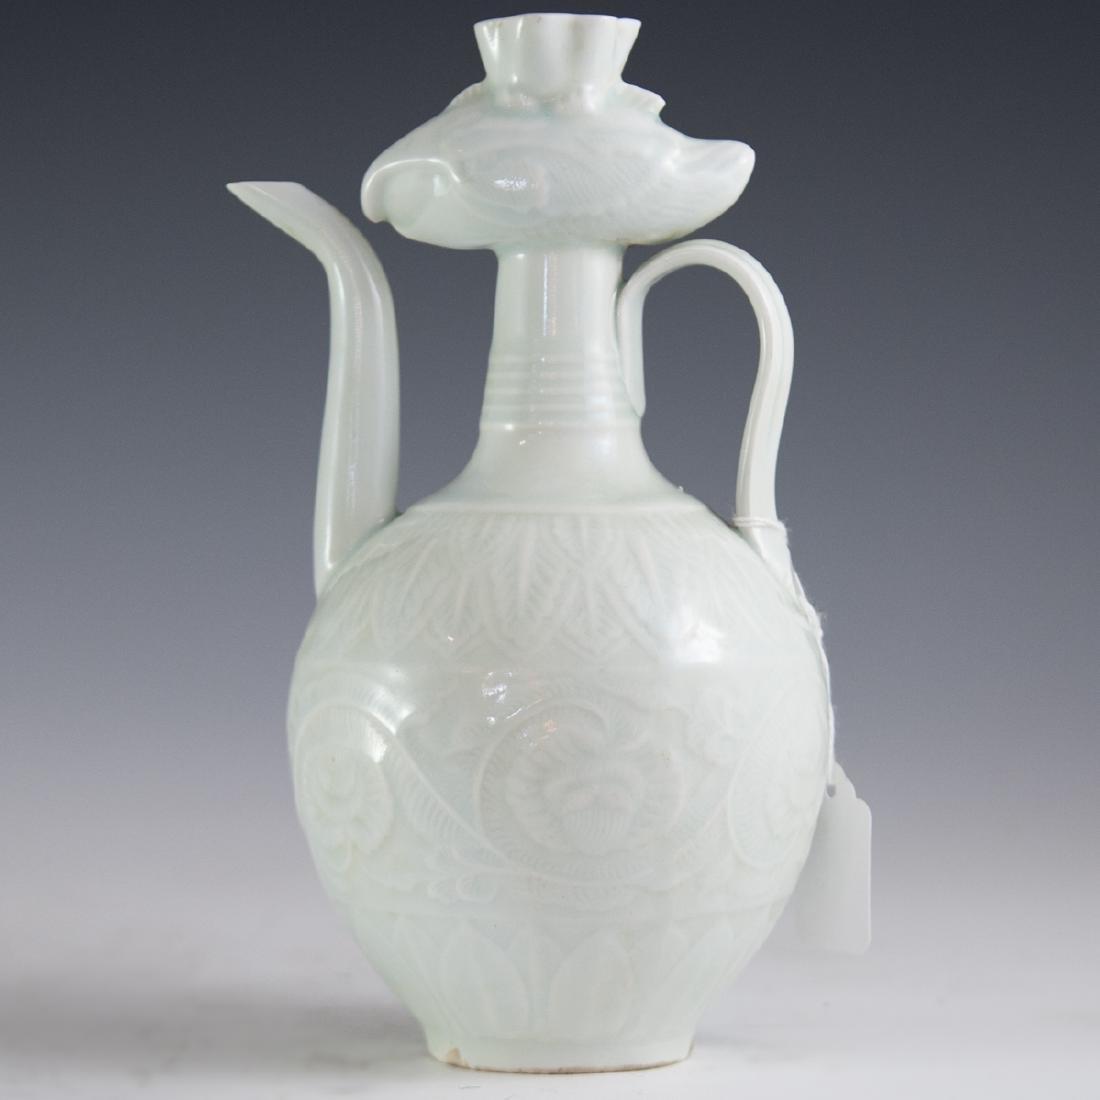 Antique Chinese Celadon Glazed Ewer